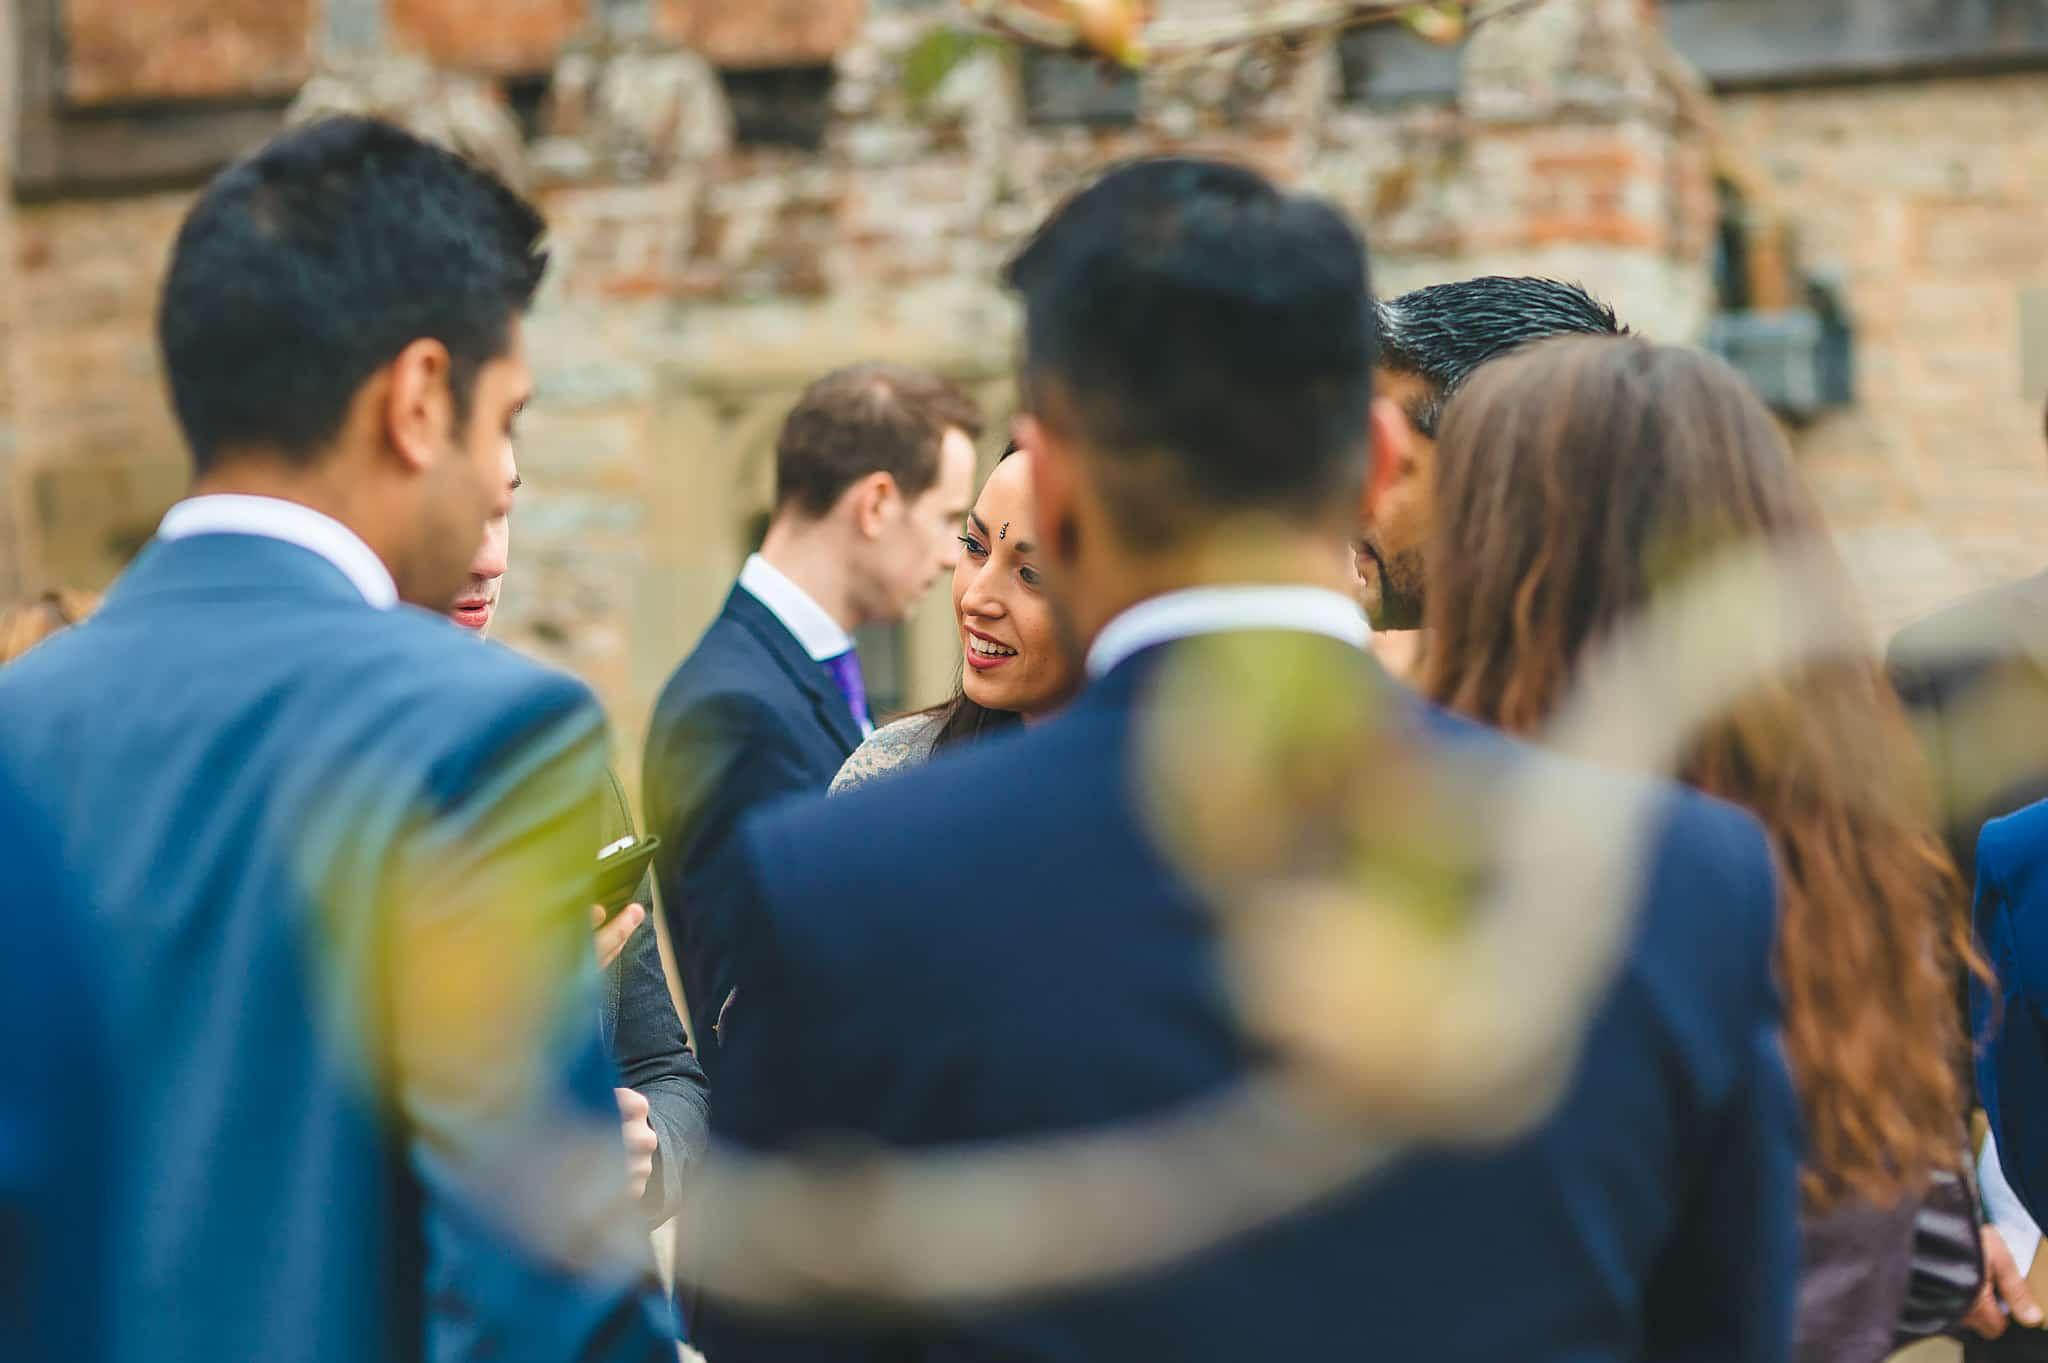 Sheena + Lee | Birtsmorton Court Wedding 17